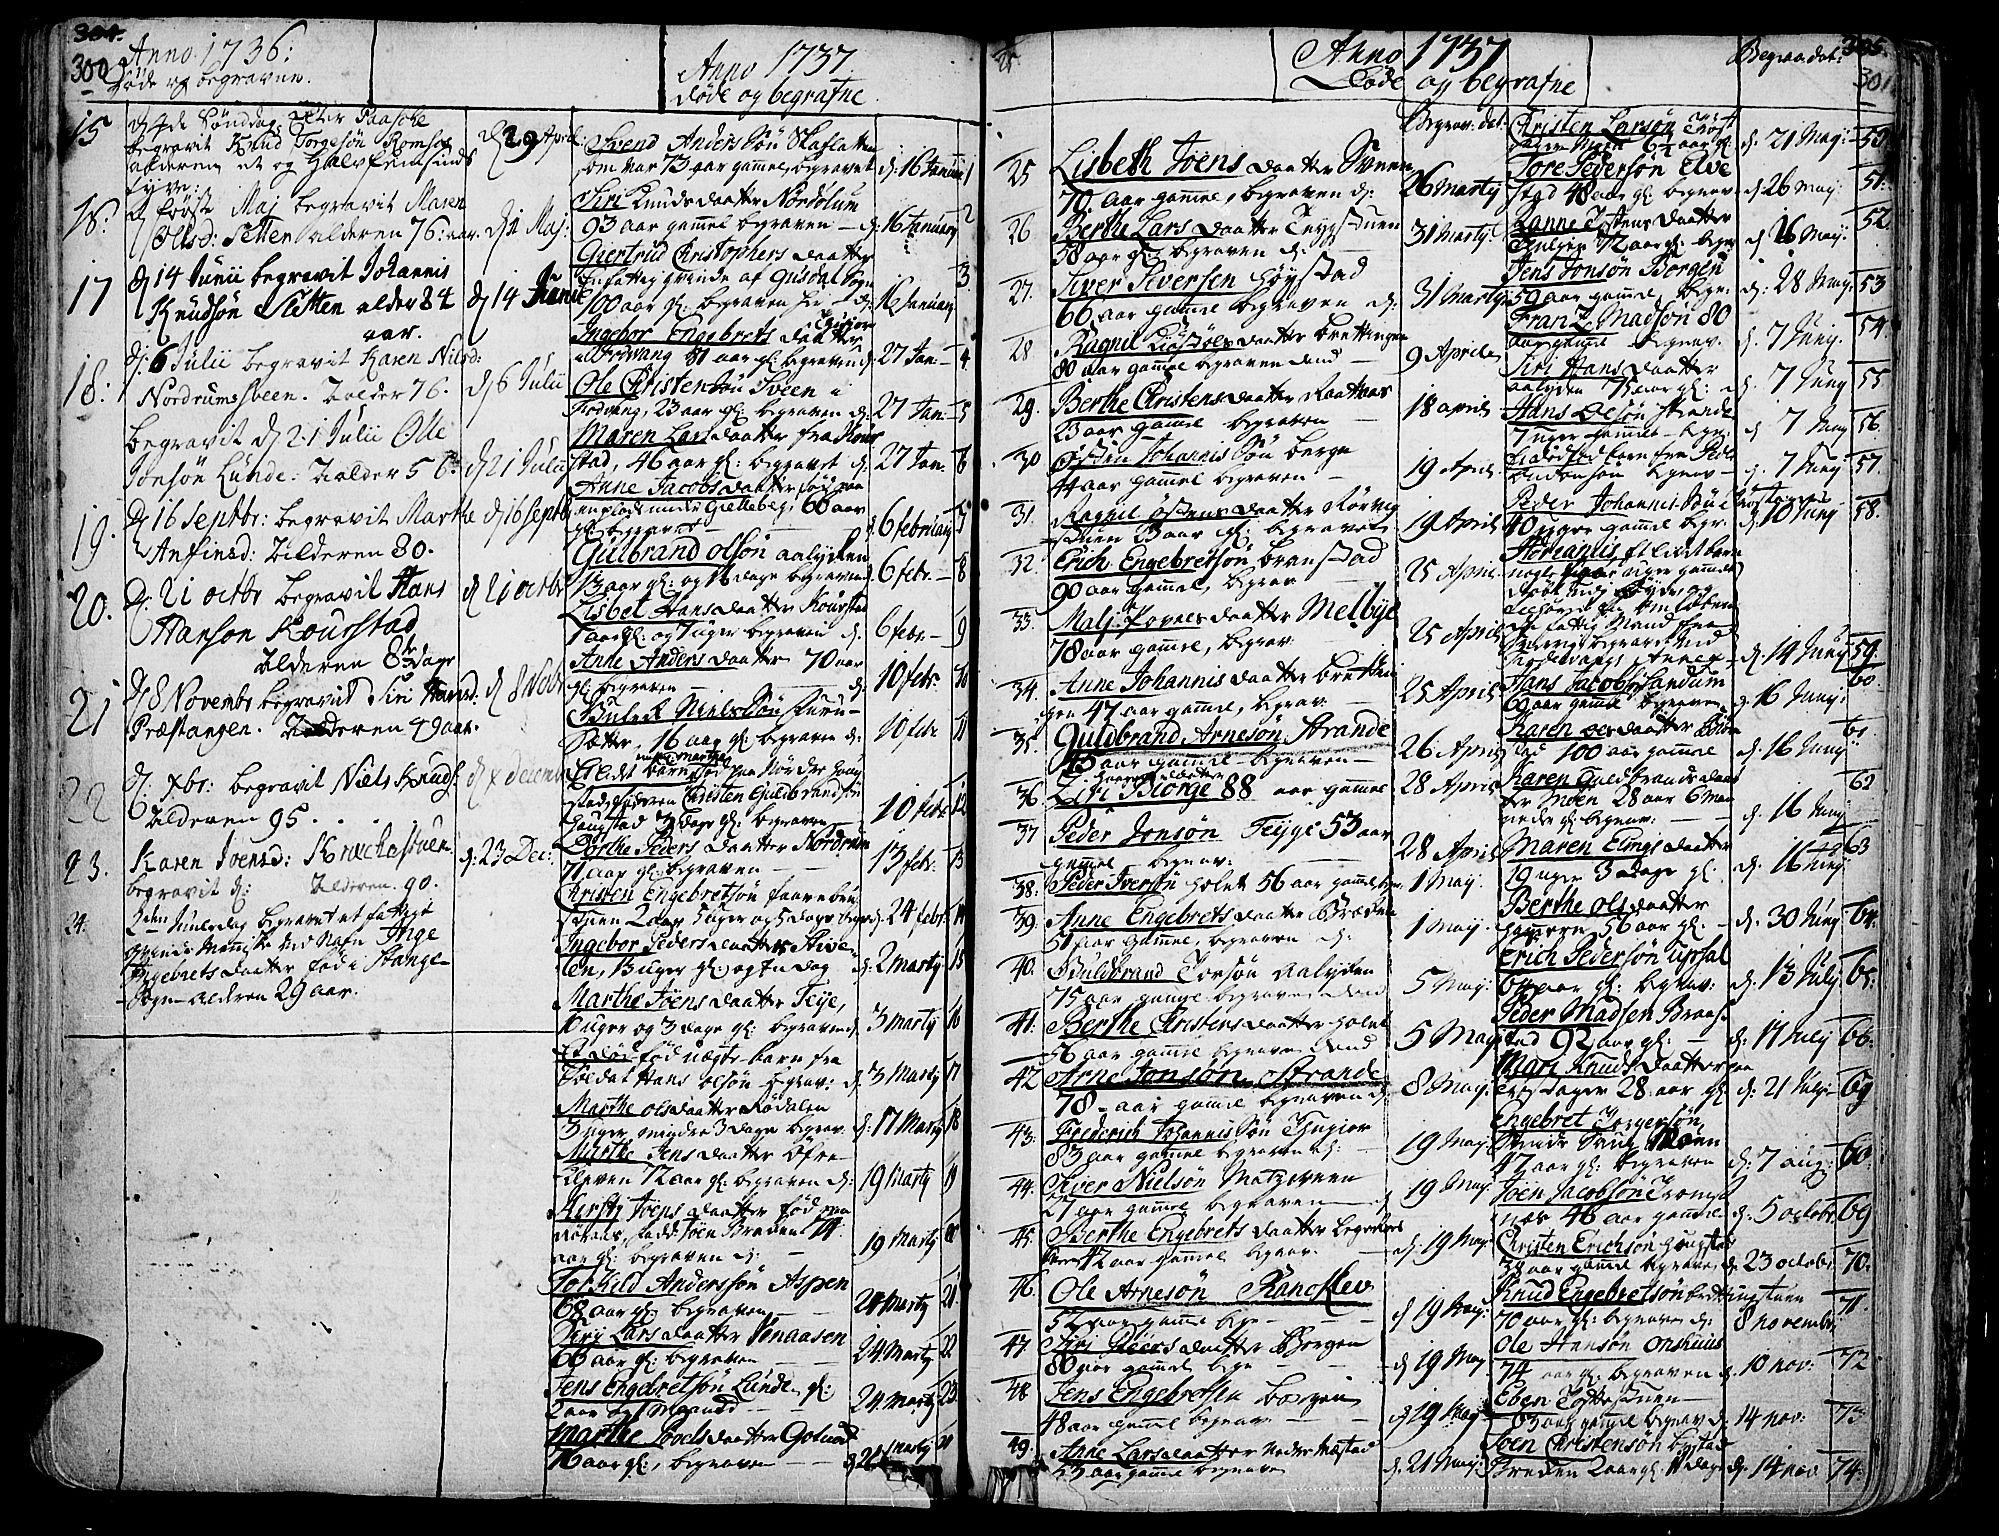 SAH, Ringebu prestekontor, Ministerialbok nr. 2, 1734-1780, s. 300-301